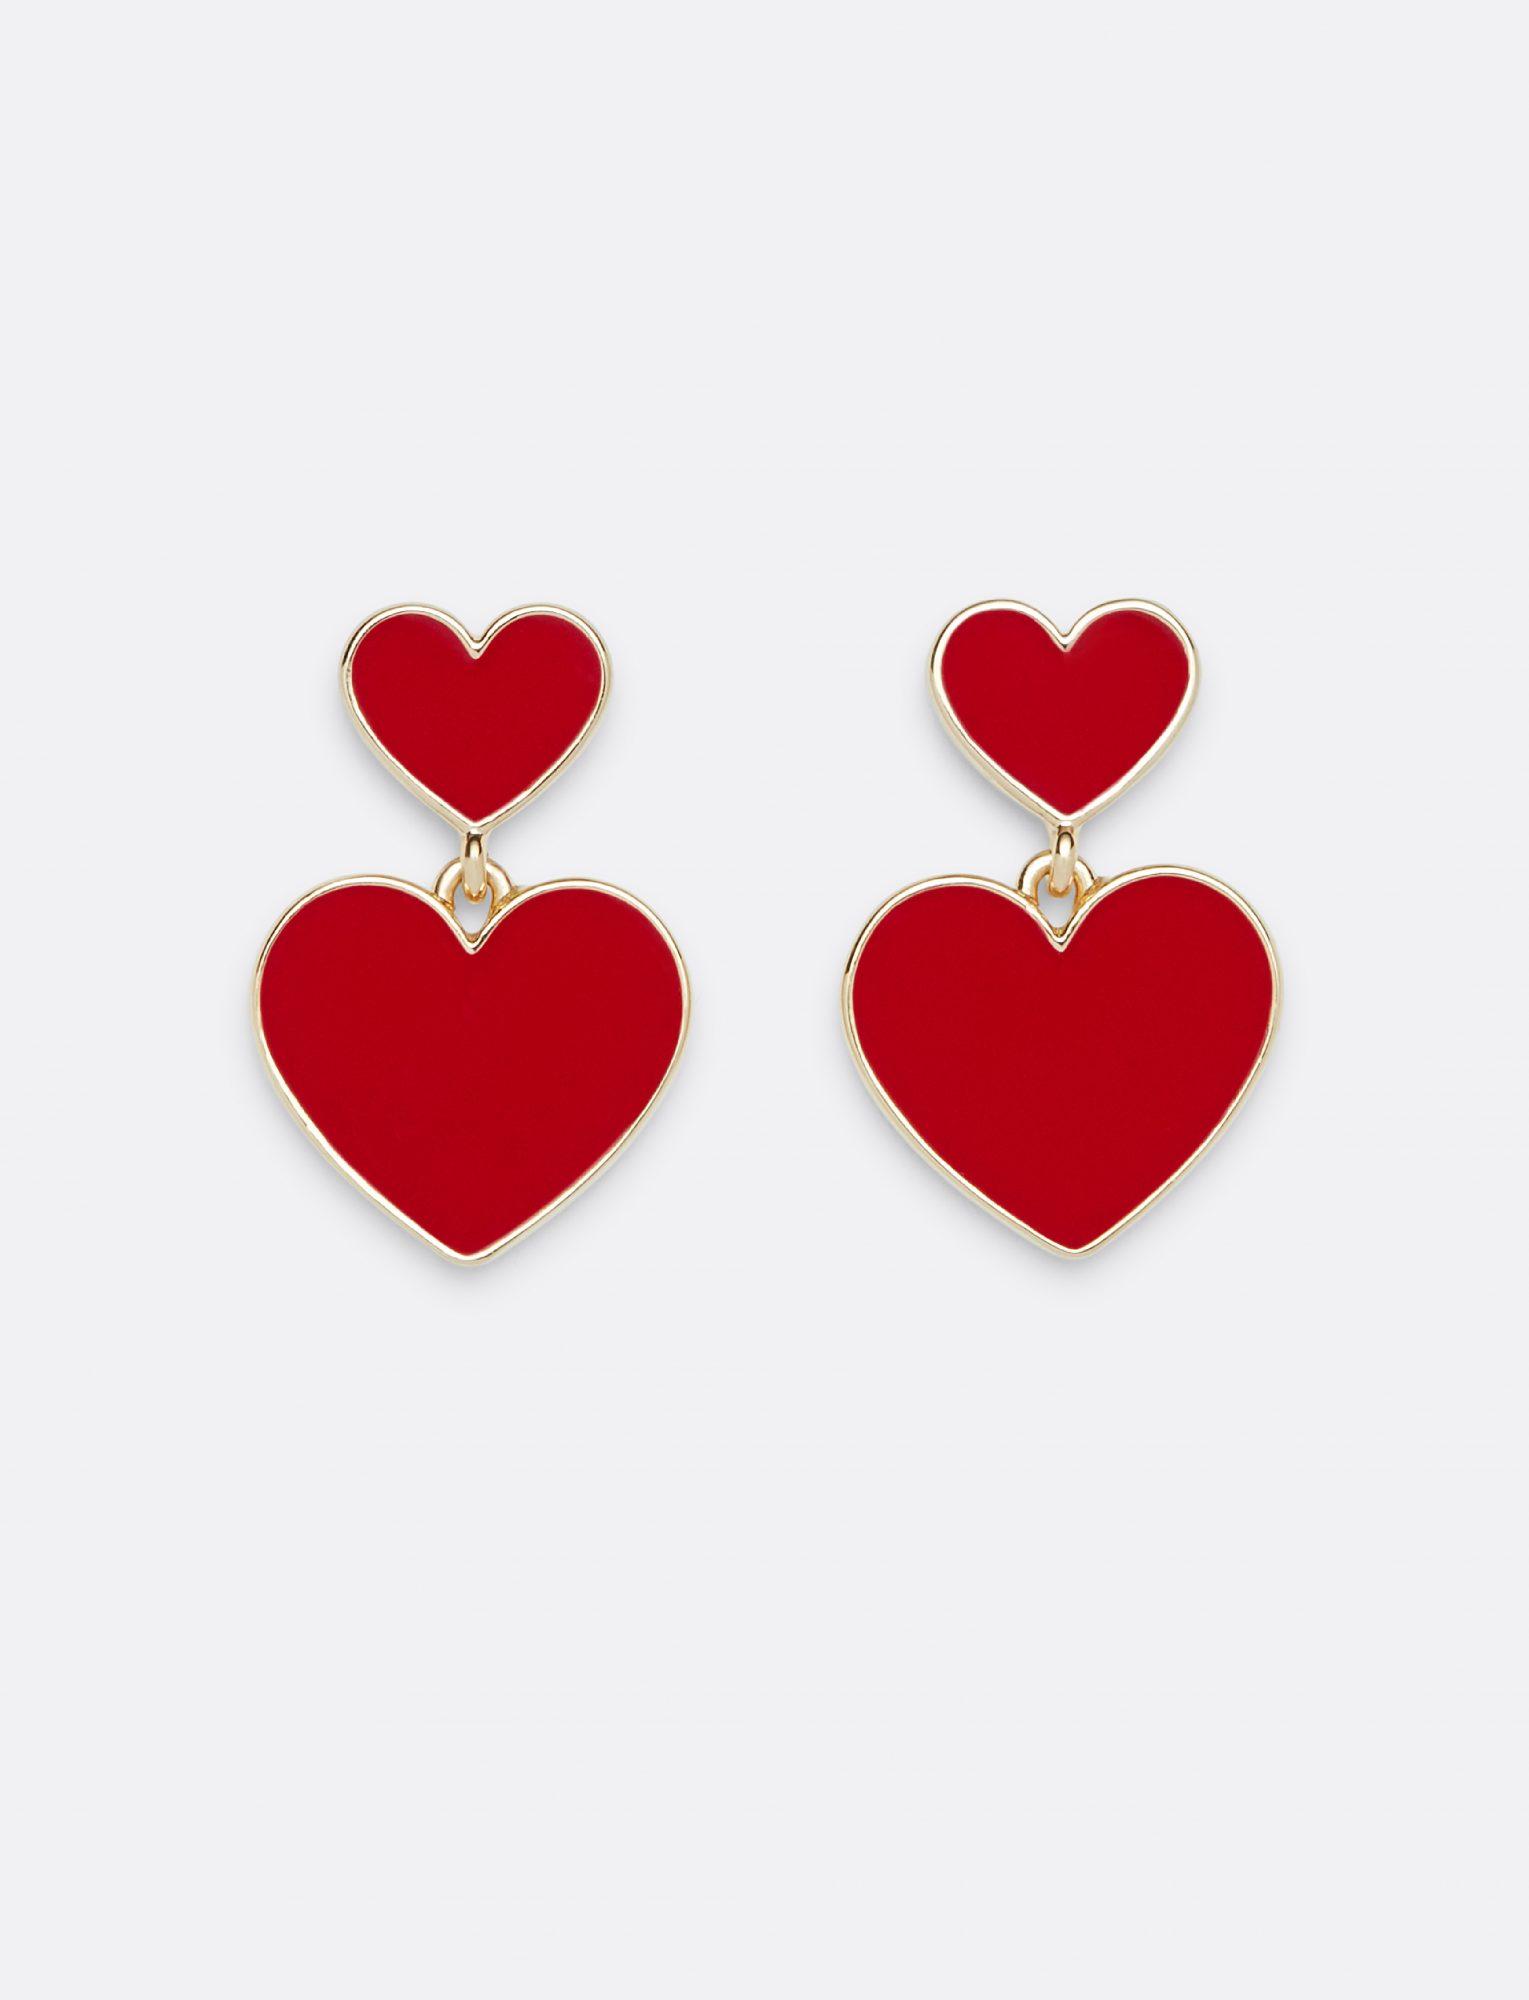 San Valentín joyería romántica